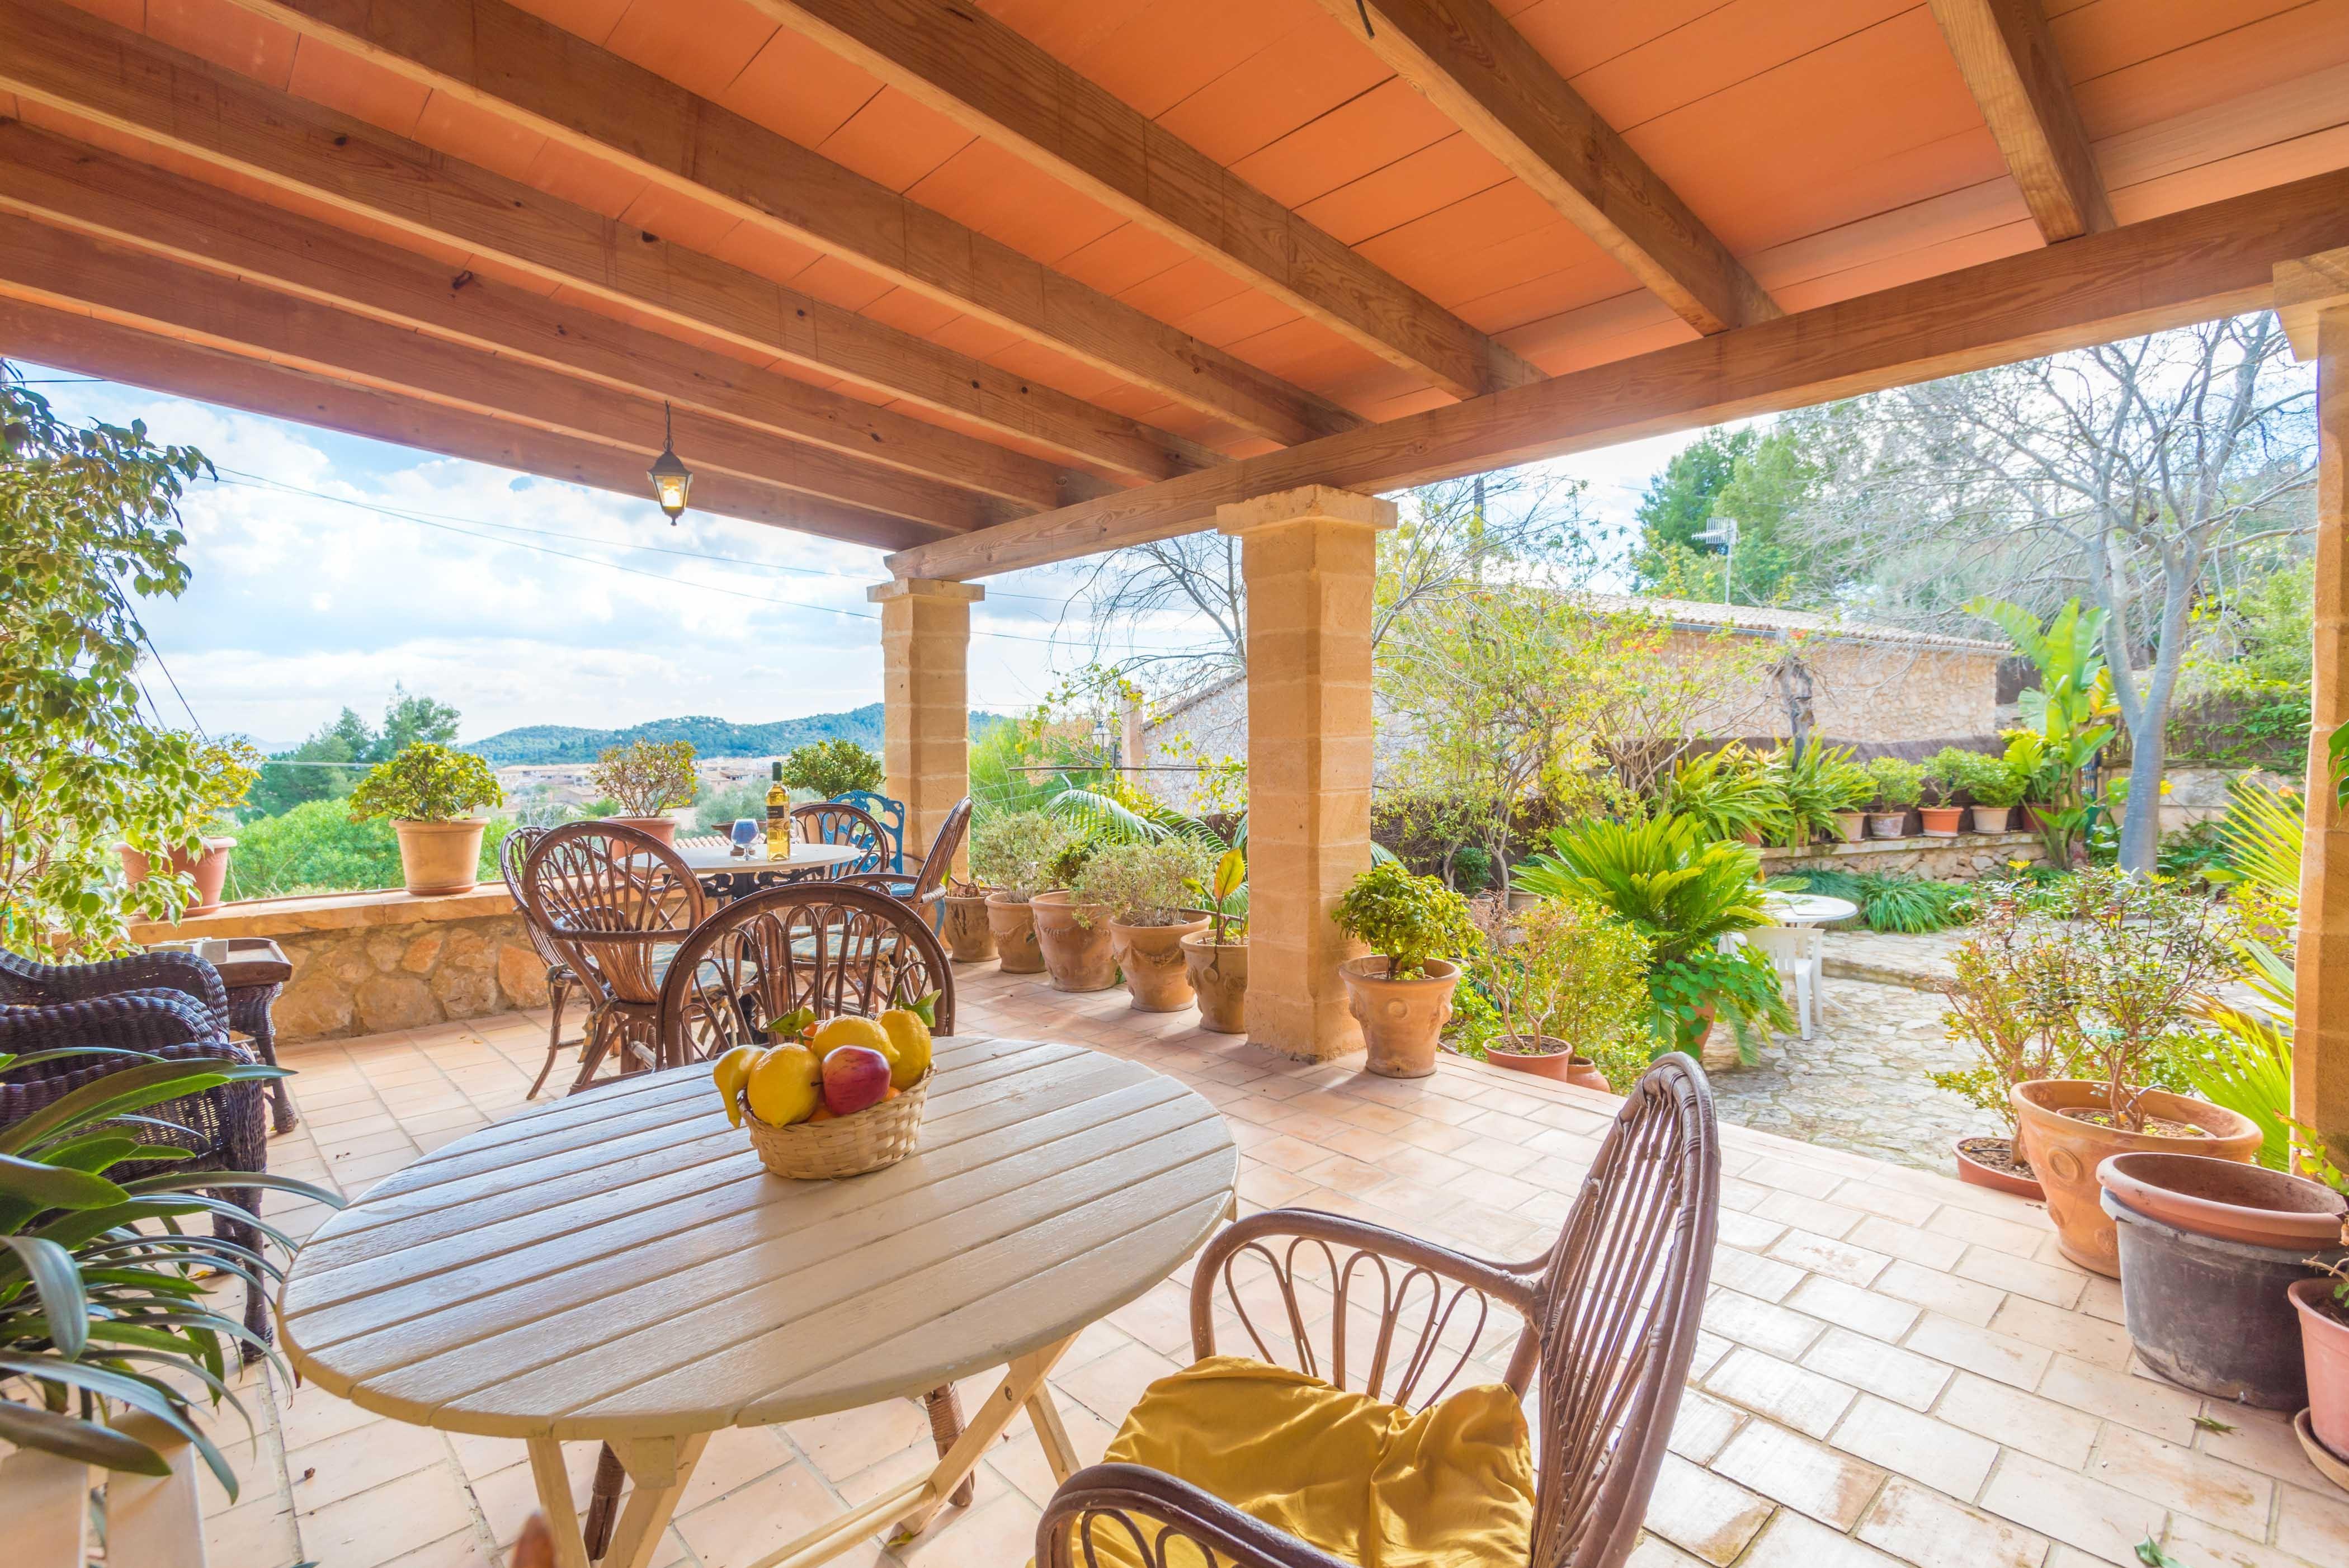 Maison de vacances CA NA CARME (ALARONERA) (2382858), Alaro, Majorque, Iles Baléares, Espagne, image 3